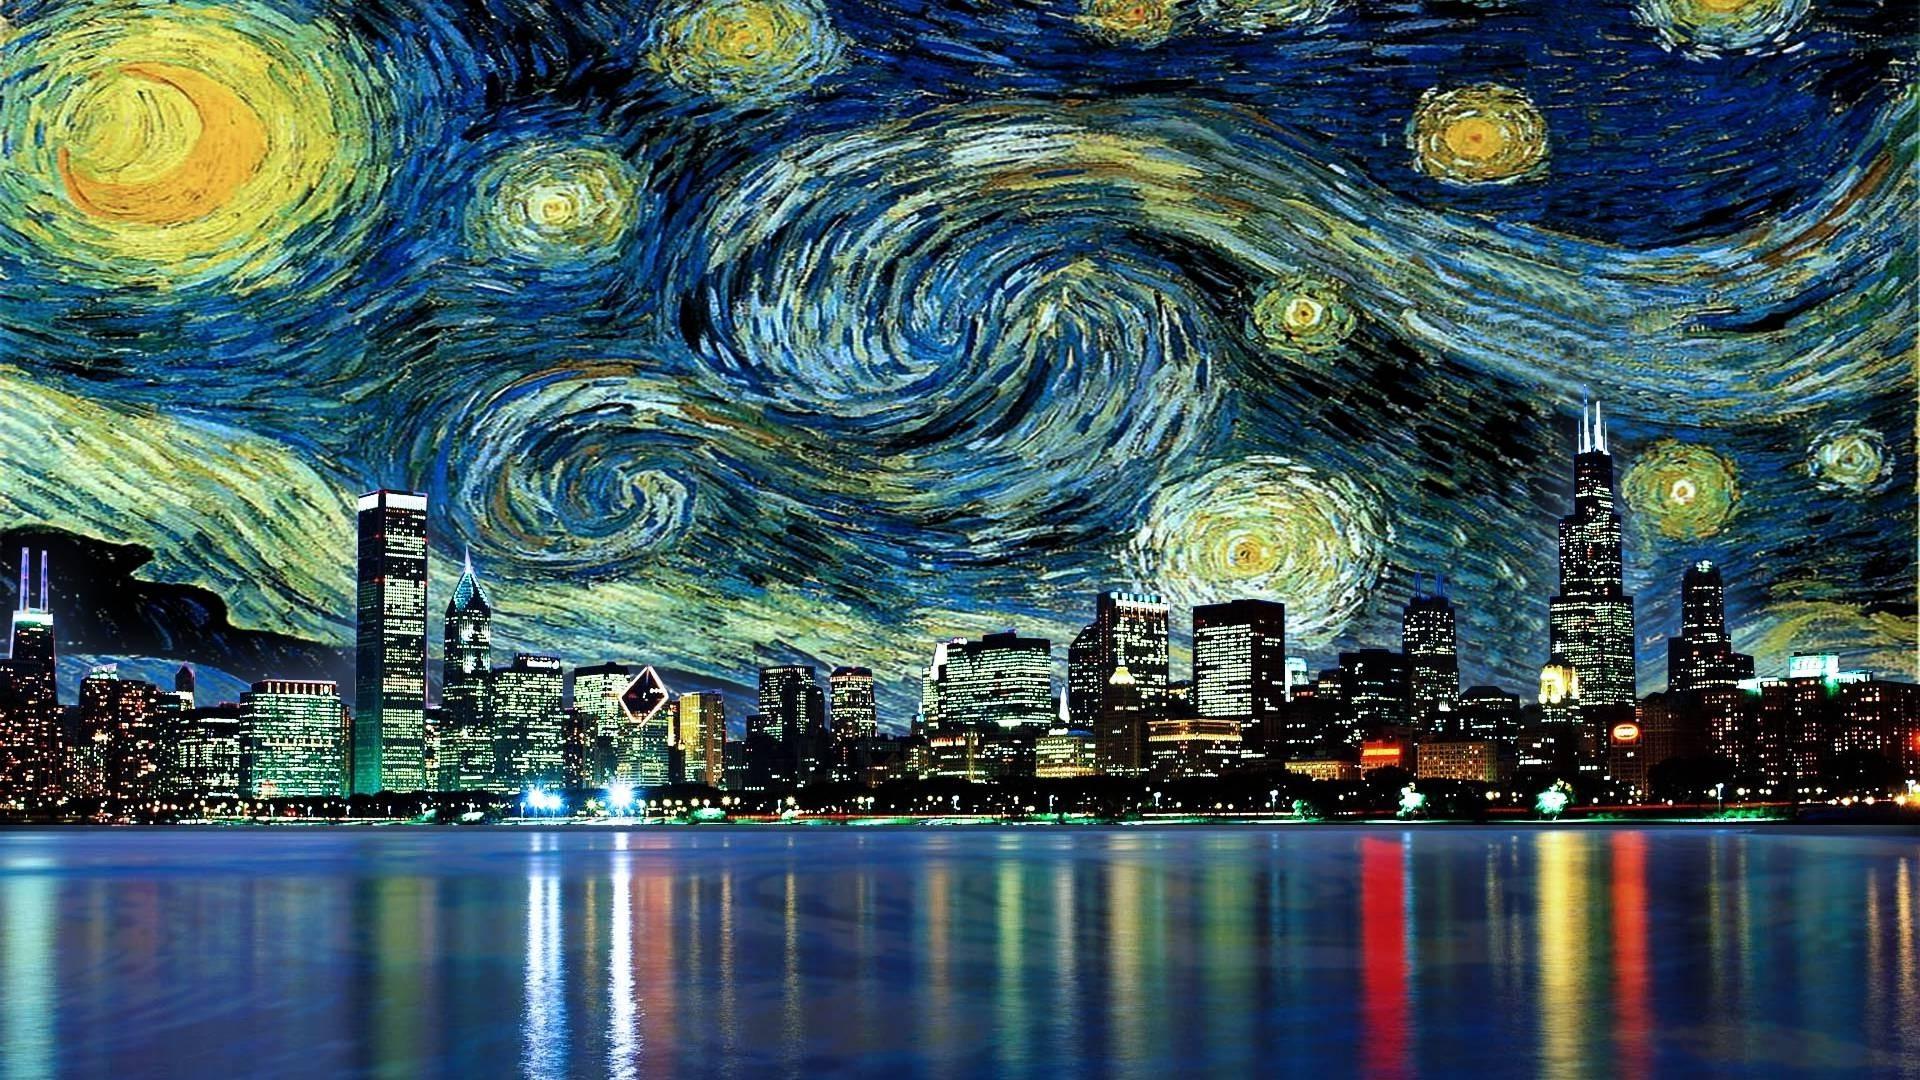 Vincent Van Gogh Starry Night Wallpaper 1920x1080